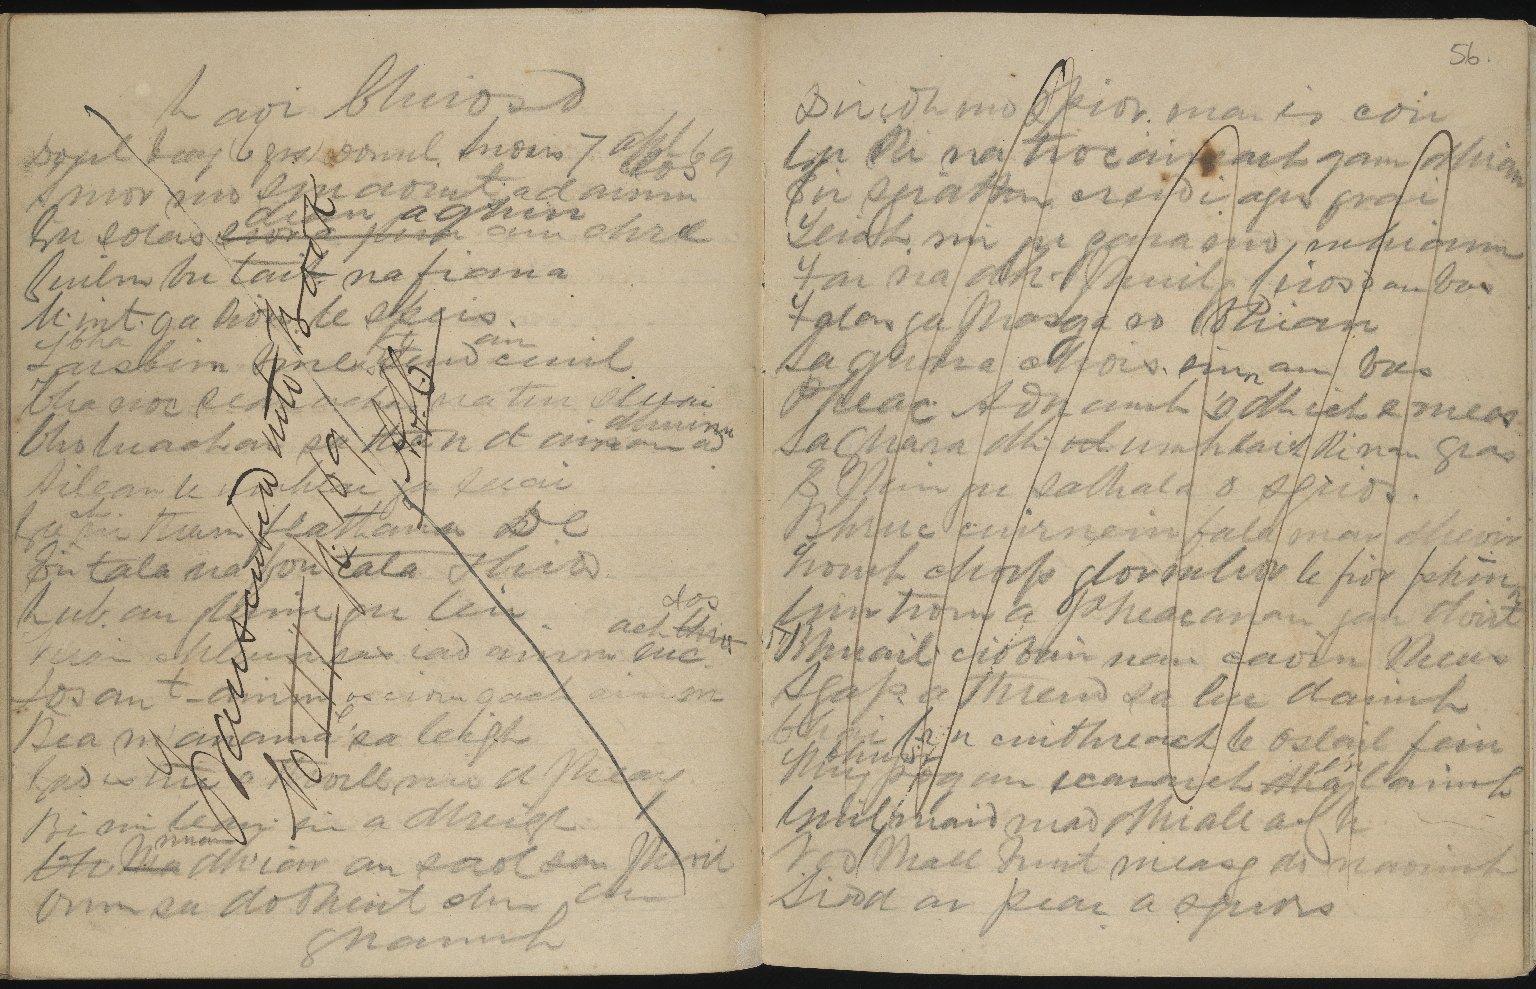 Field Notebook, ff.55v-56r